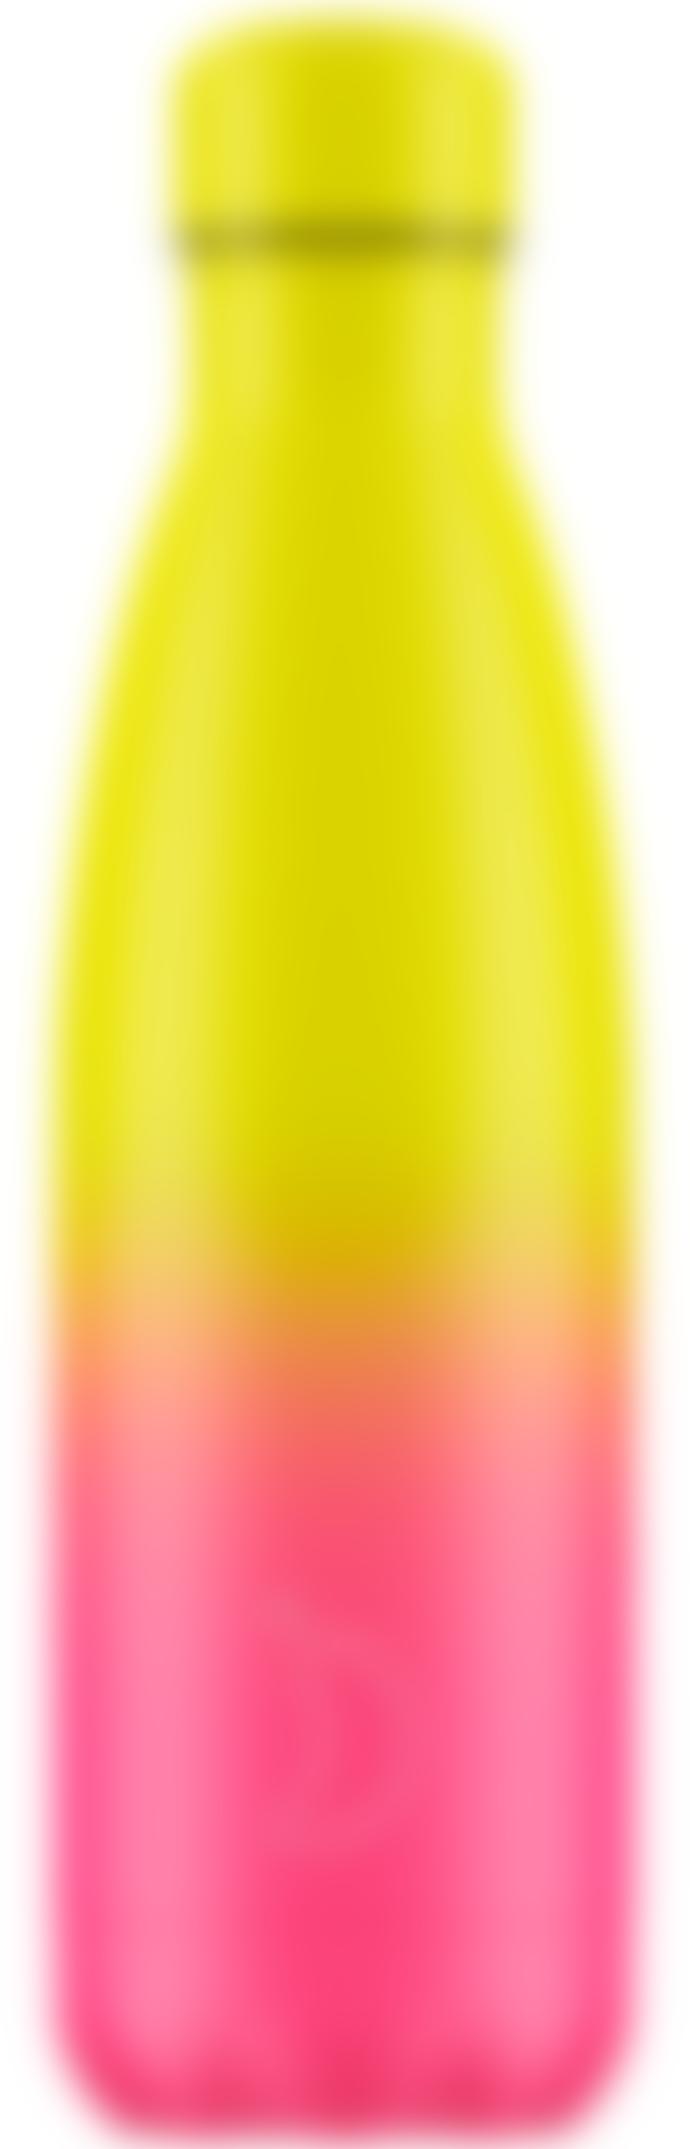 Chilly's Bottles 0.5 l Gradient Neon Clima Bottle